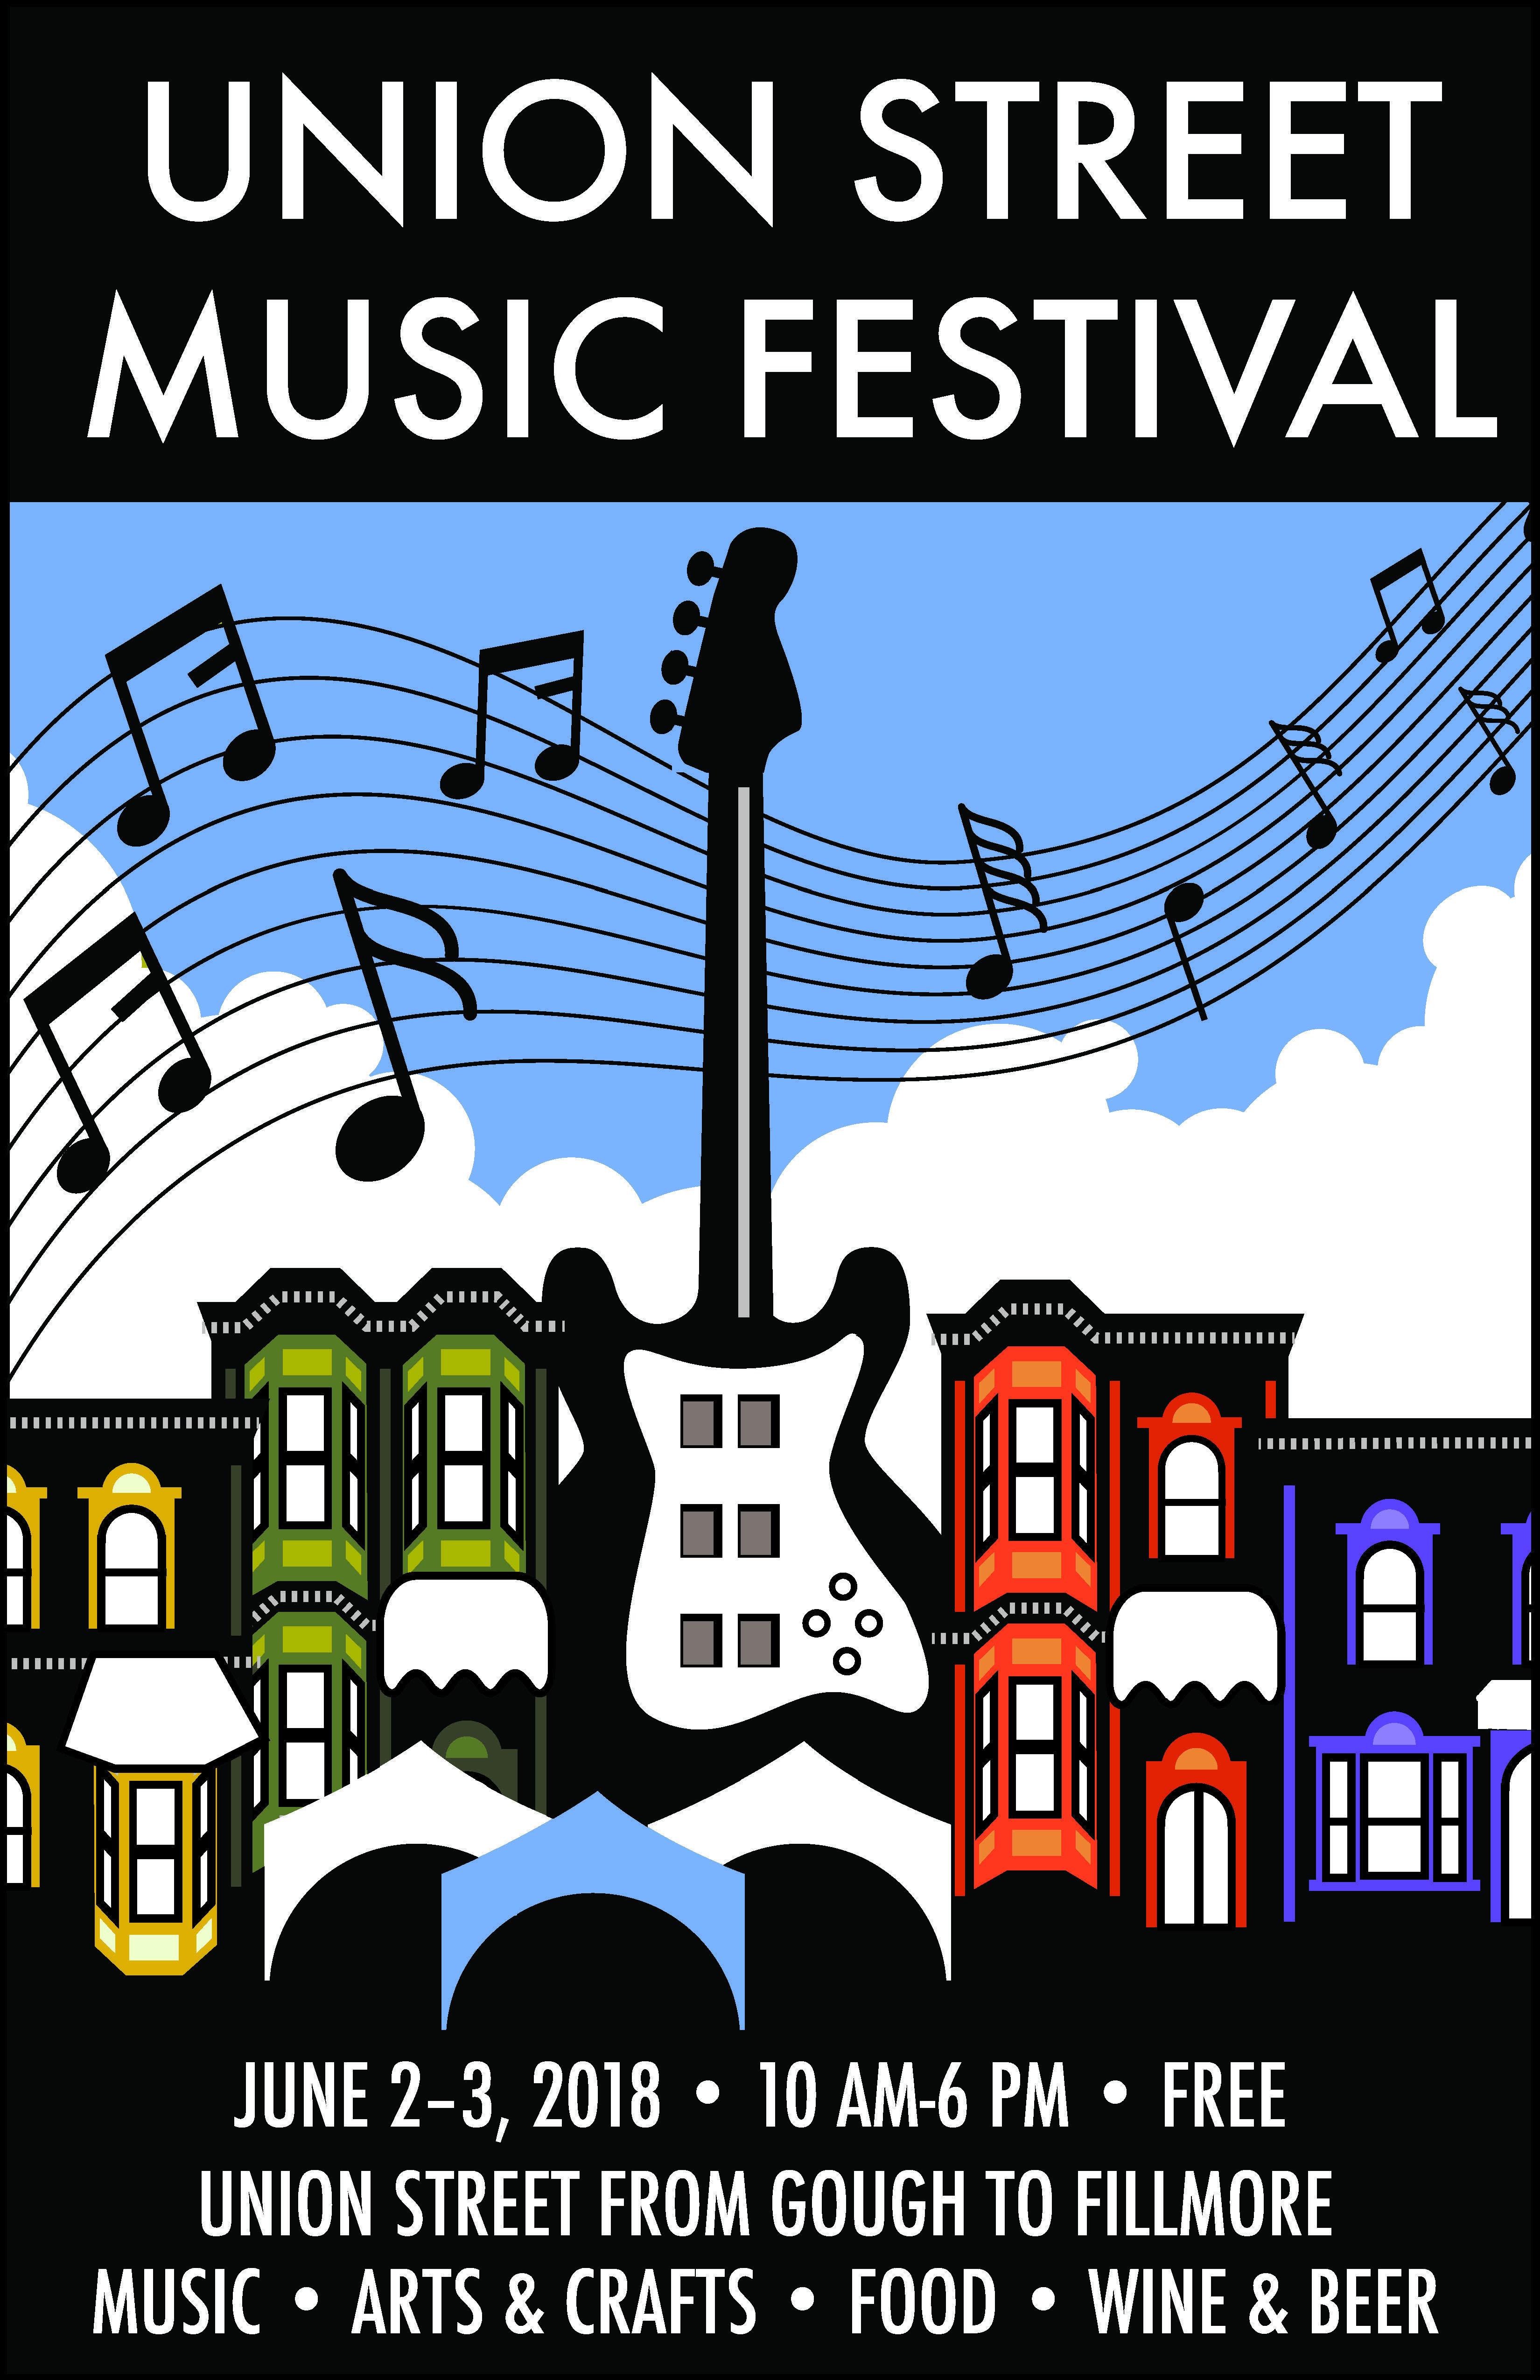 Union Street Music Festival